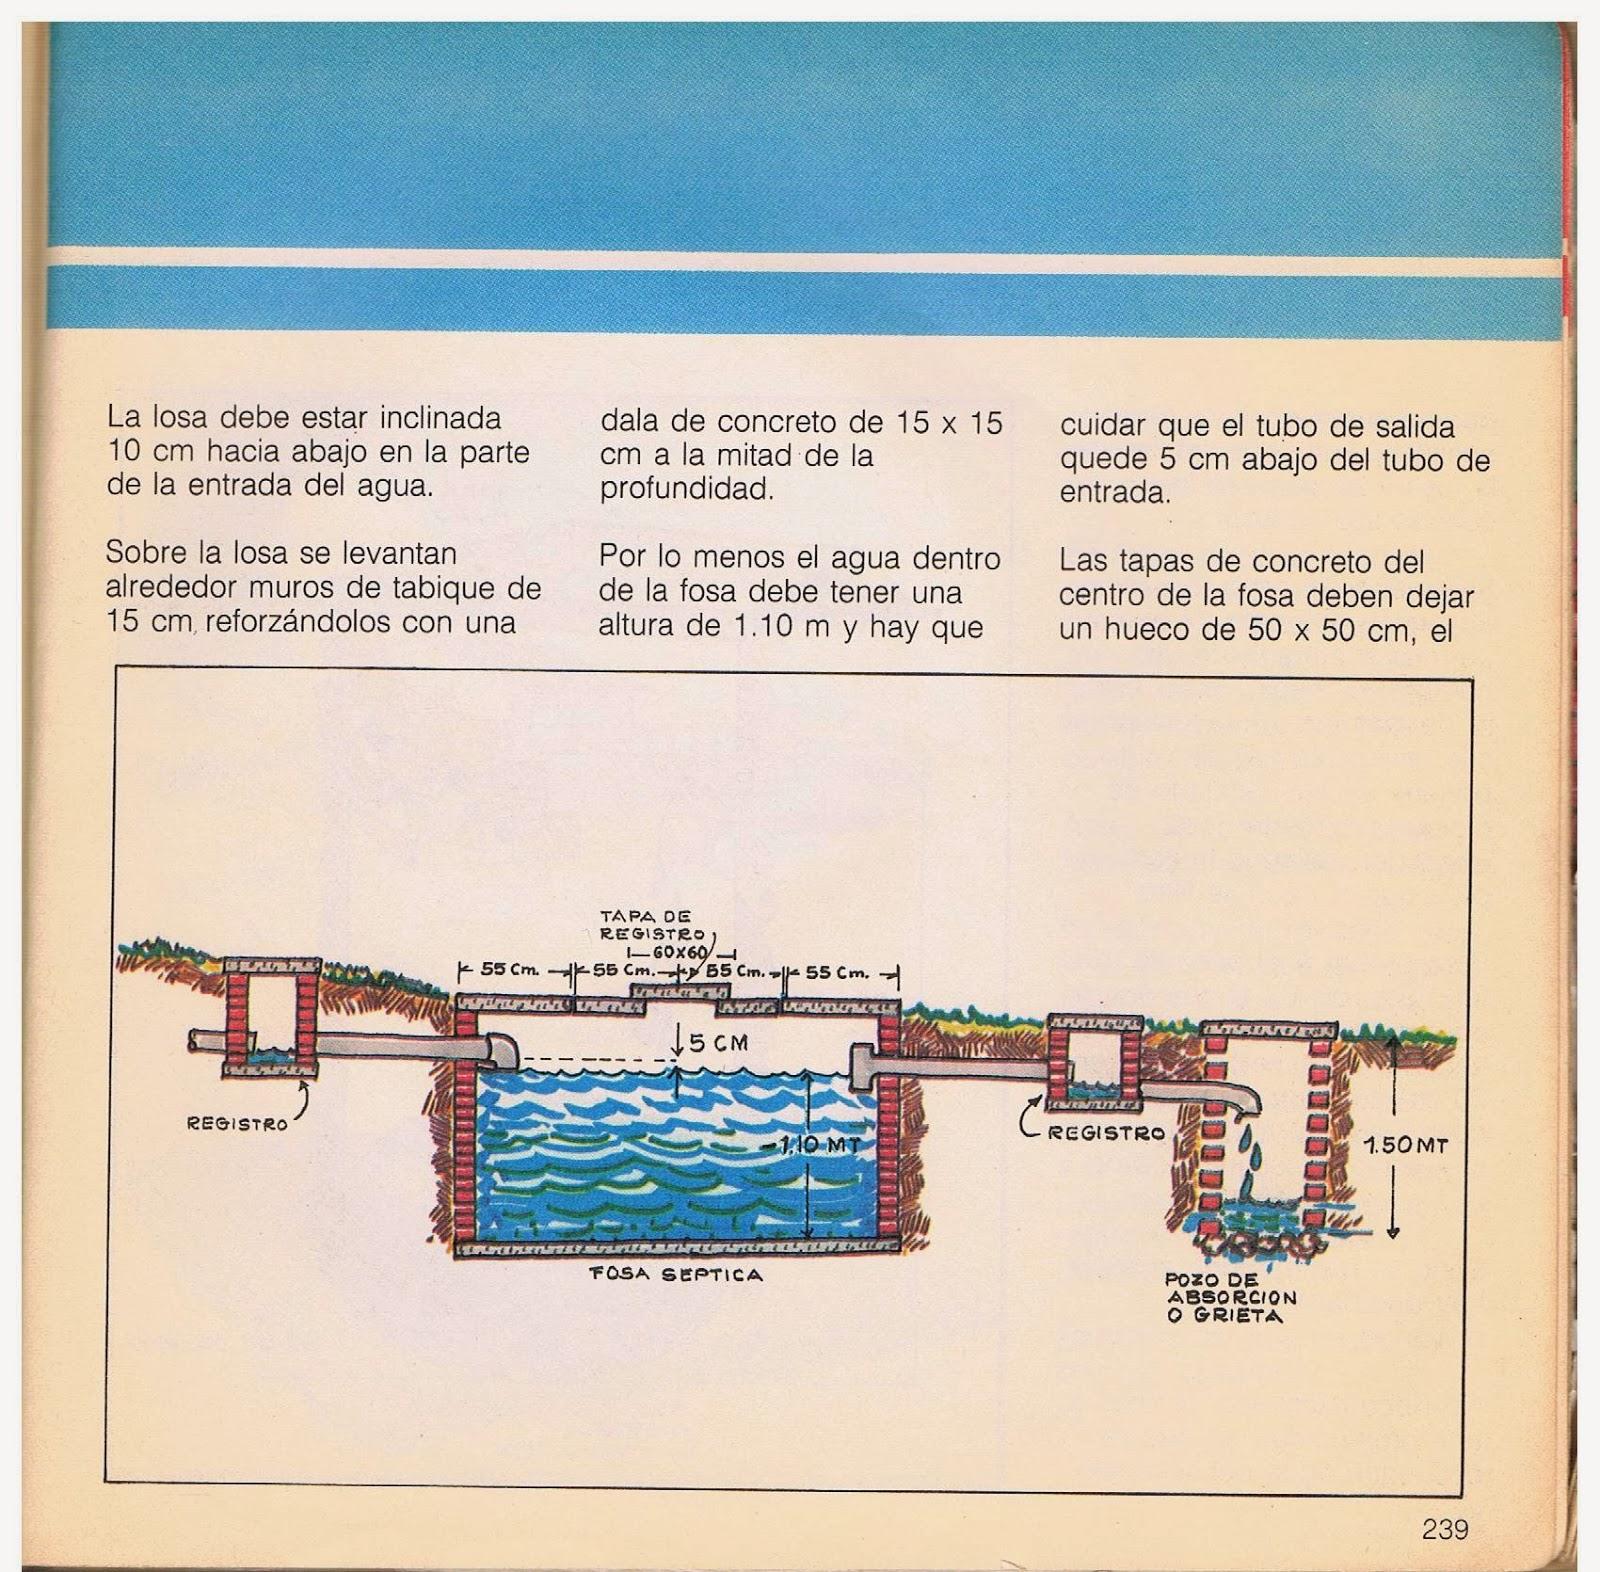 Manual para construccion de fosa septica download free - Construir fosa septica ...